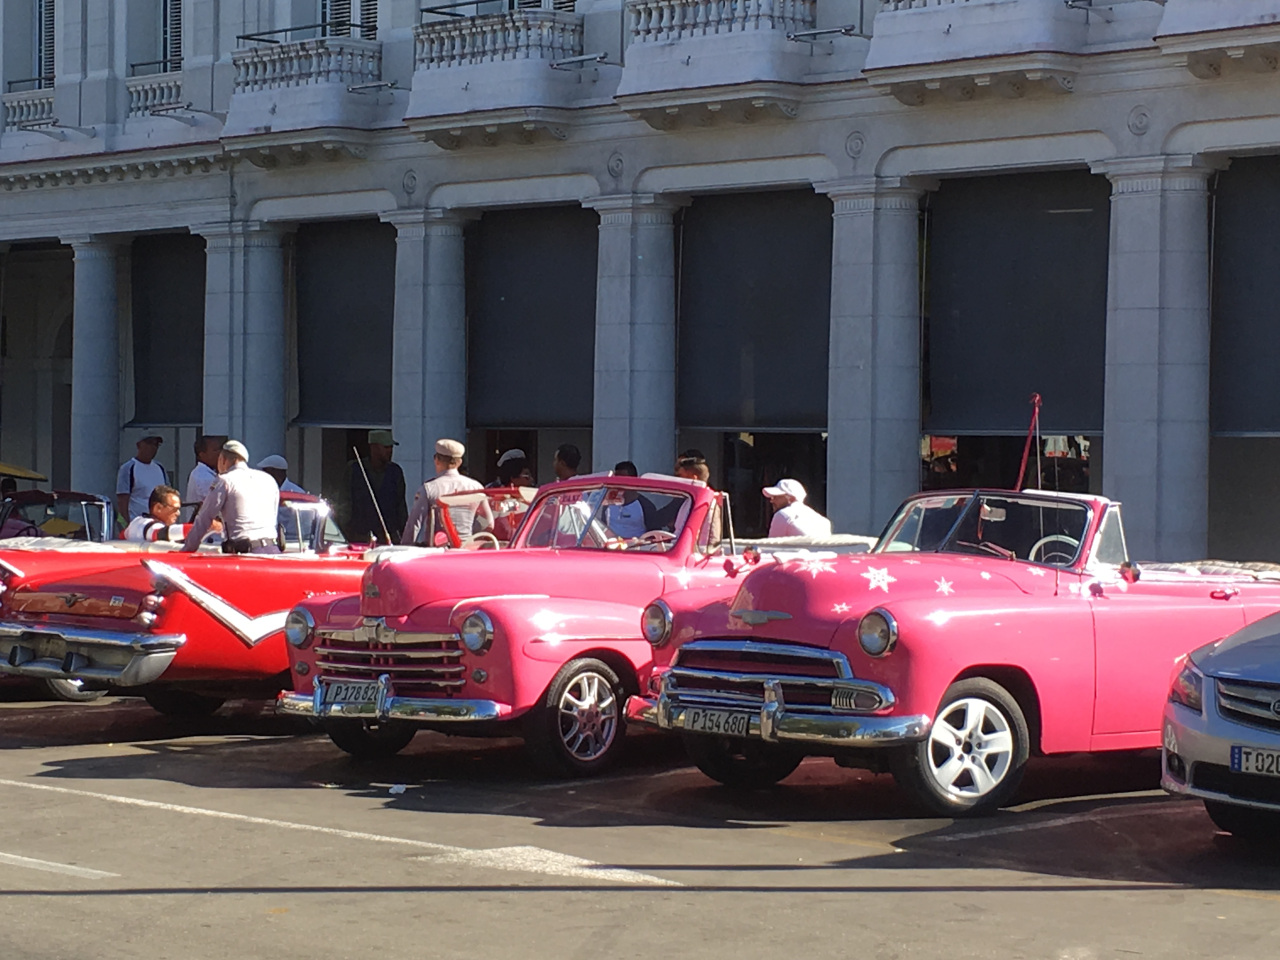 Cuba, Classic American cars. What to do in Havana, Cuba - the ultimate Havana guide